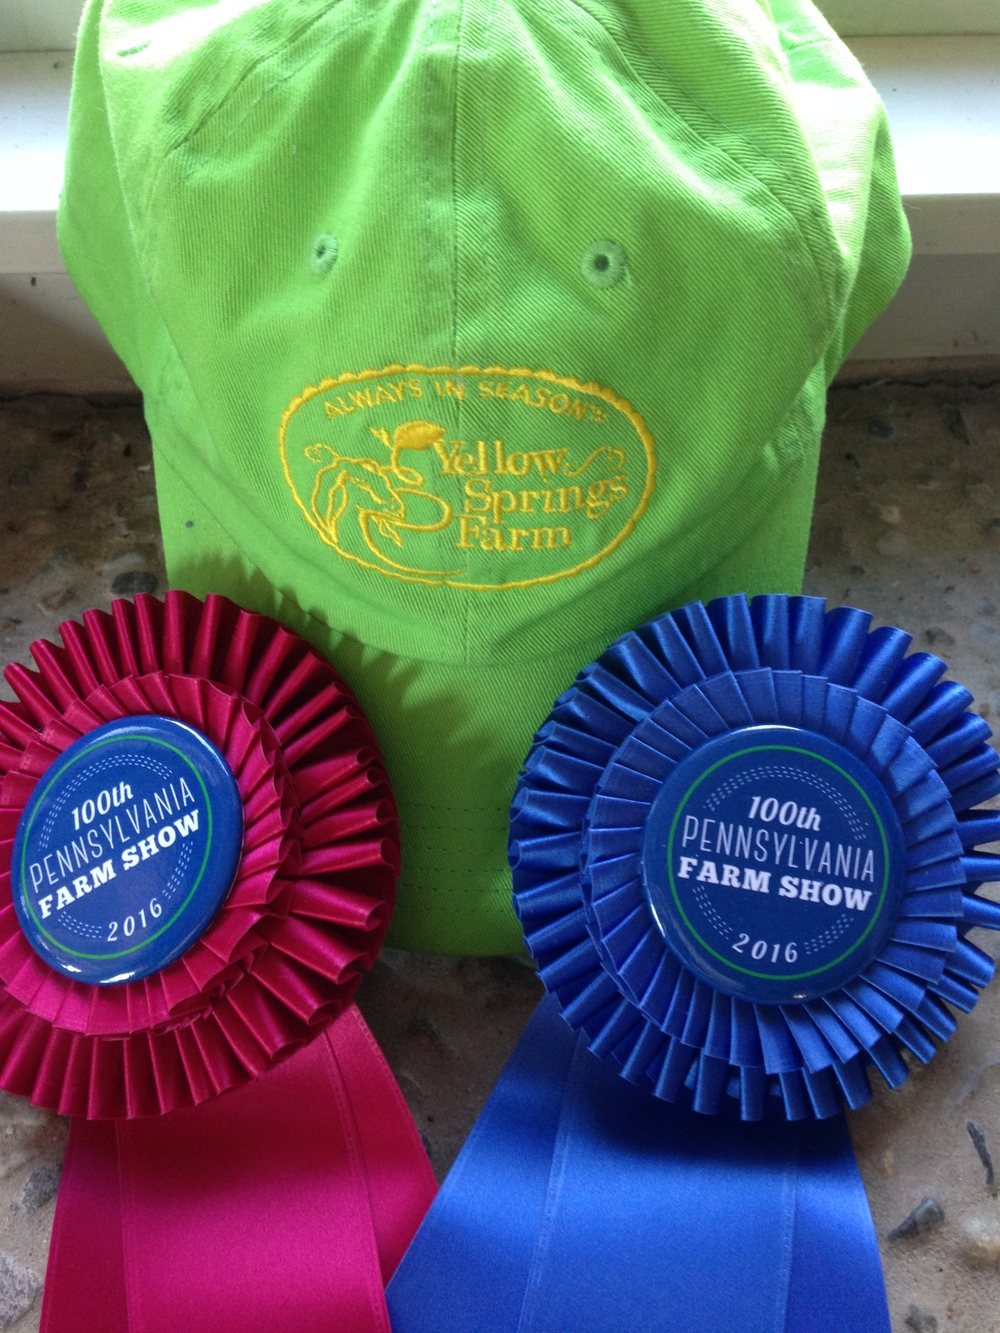 2016 farm show ribbons.JPG